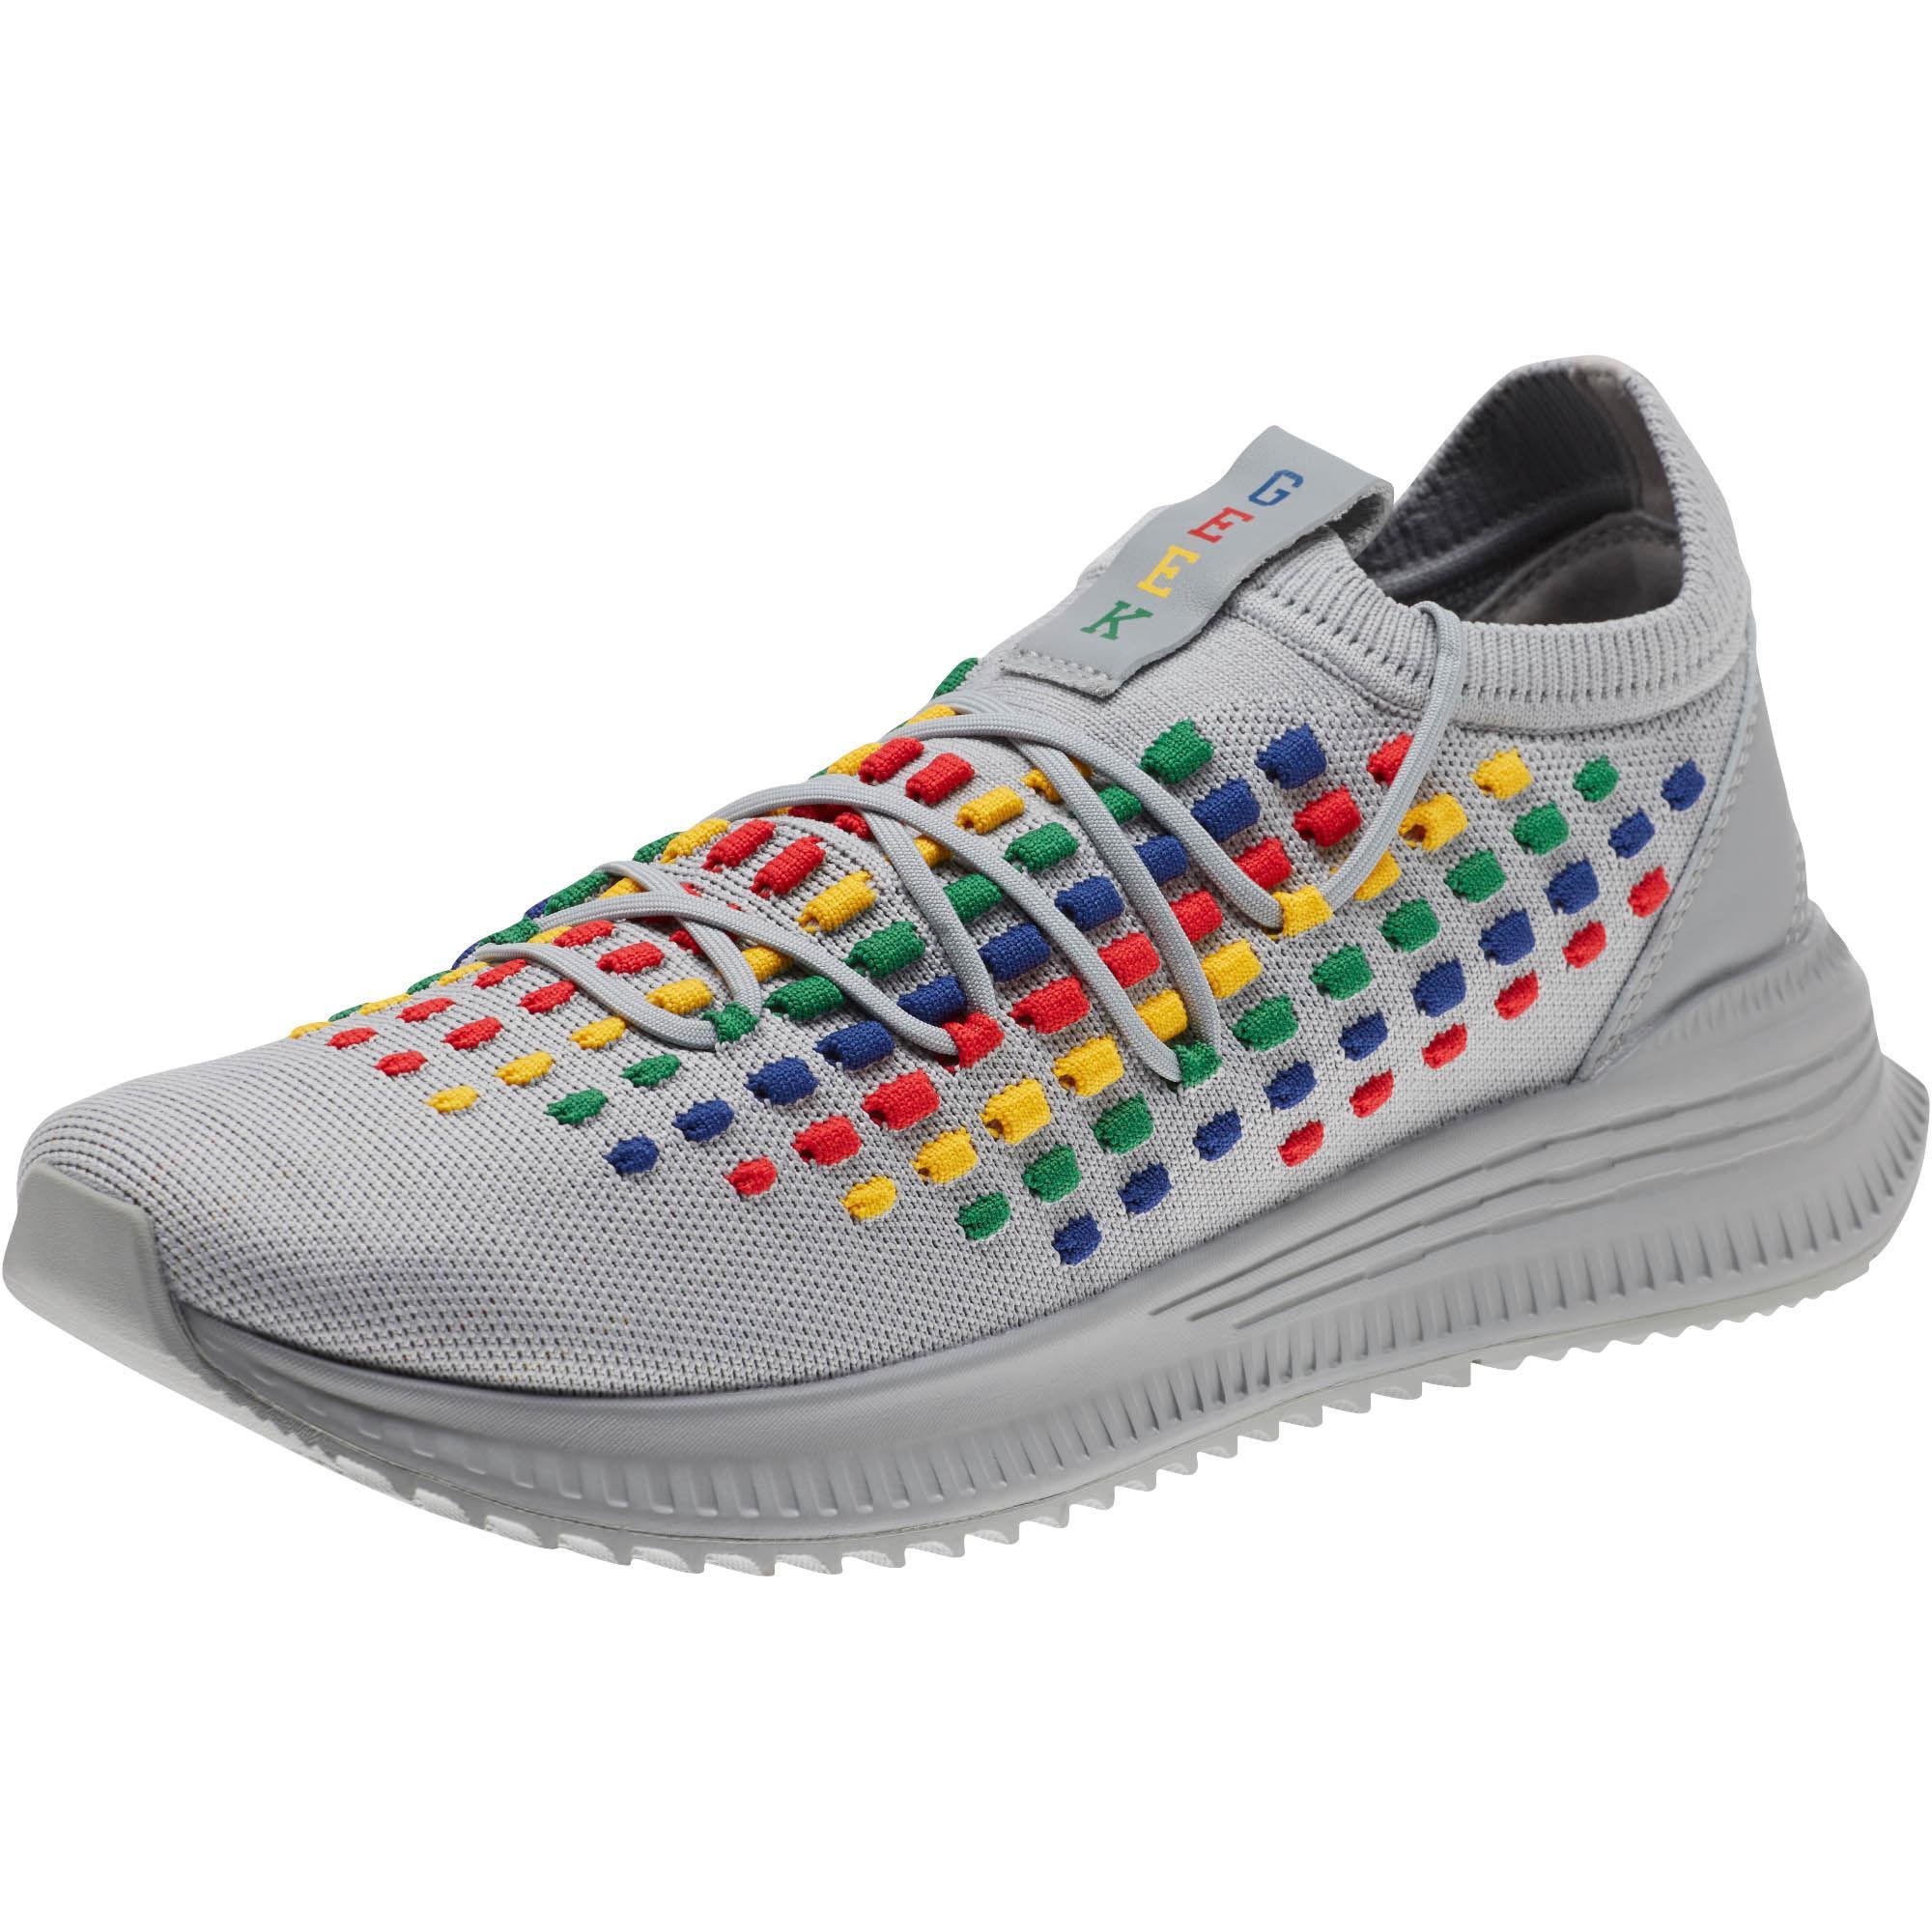 8ab6cc1d02a1ad Lyst - PUMA X Fashion Geek Avid Fusefit Men s Sneakers for Men